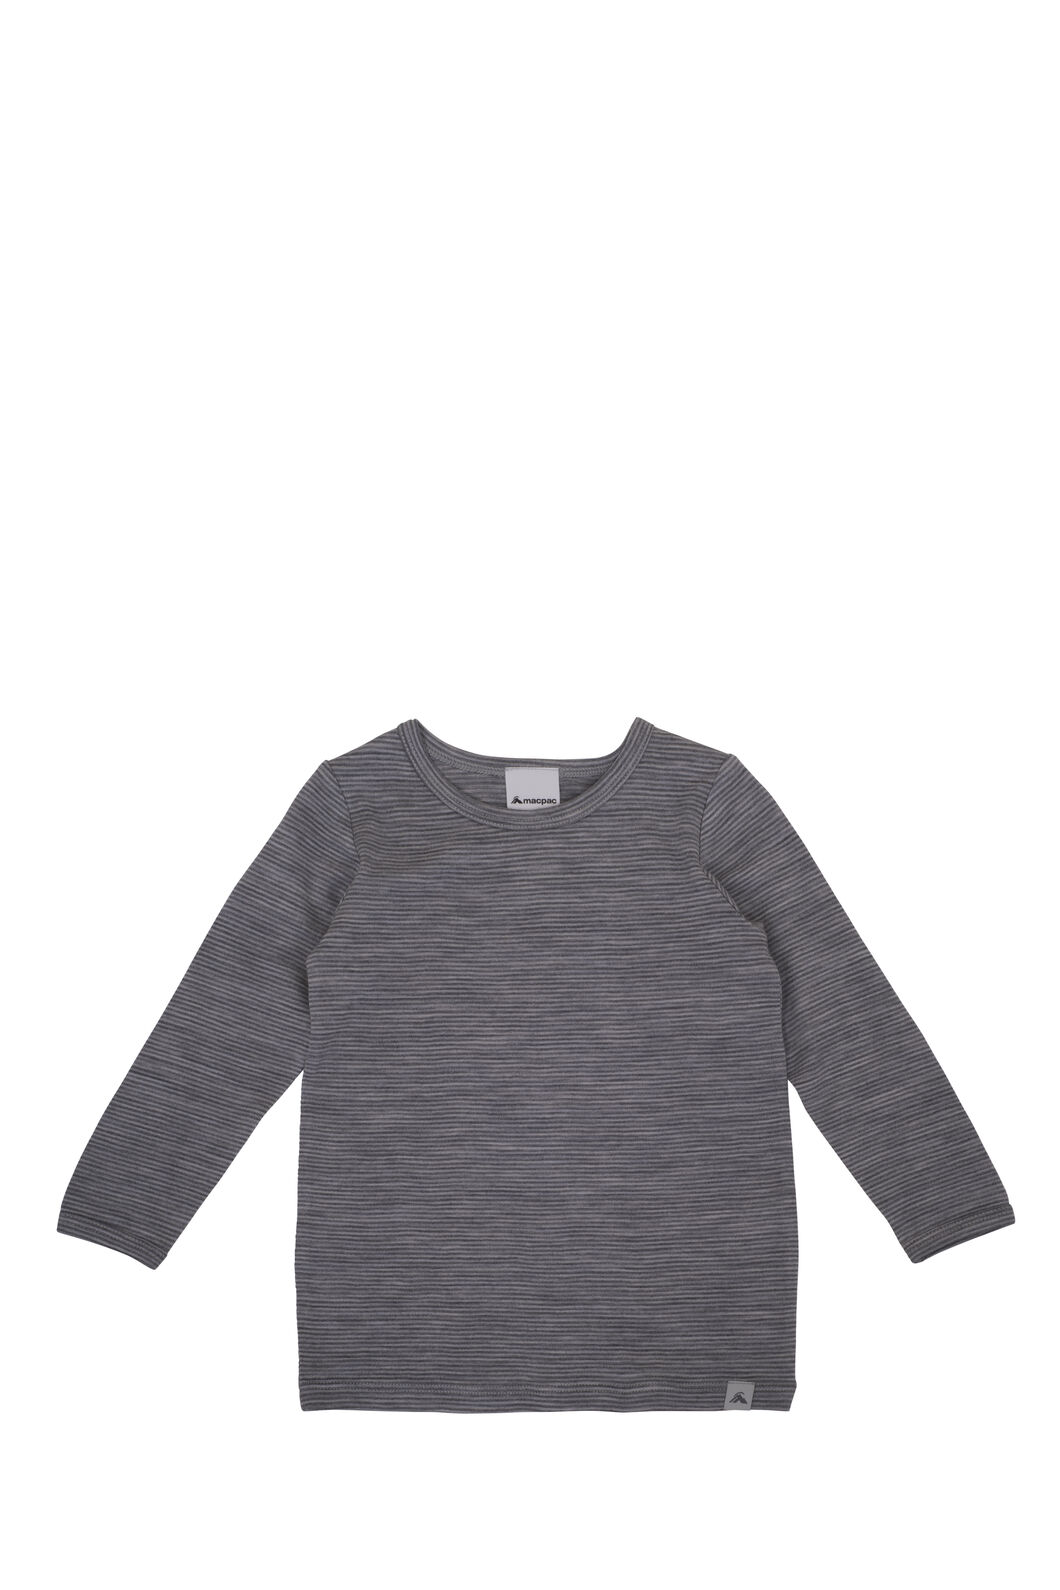 Macpac 150 Merino Long Sleeve Top - Baby, Light Grey Stripe, hi-res